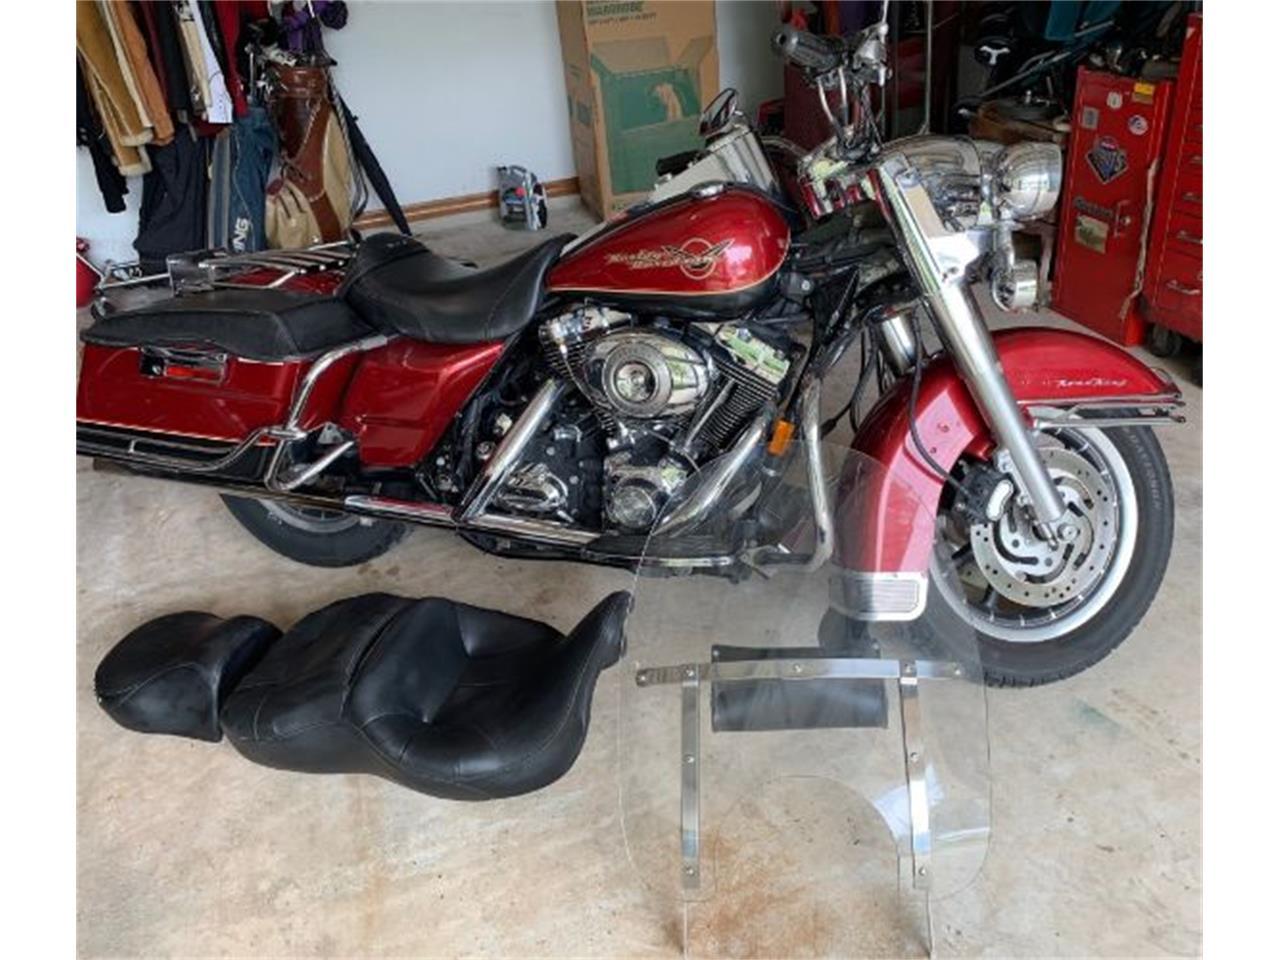 2007 Harley-Davidson Road King (CC-1274317) for sale in Cadillac, Michigan